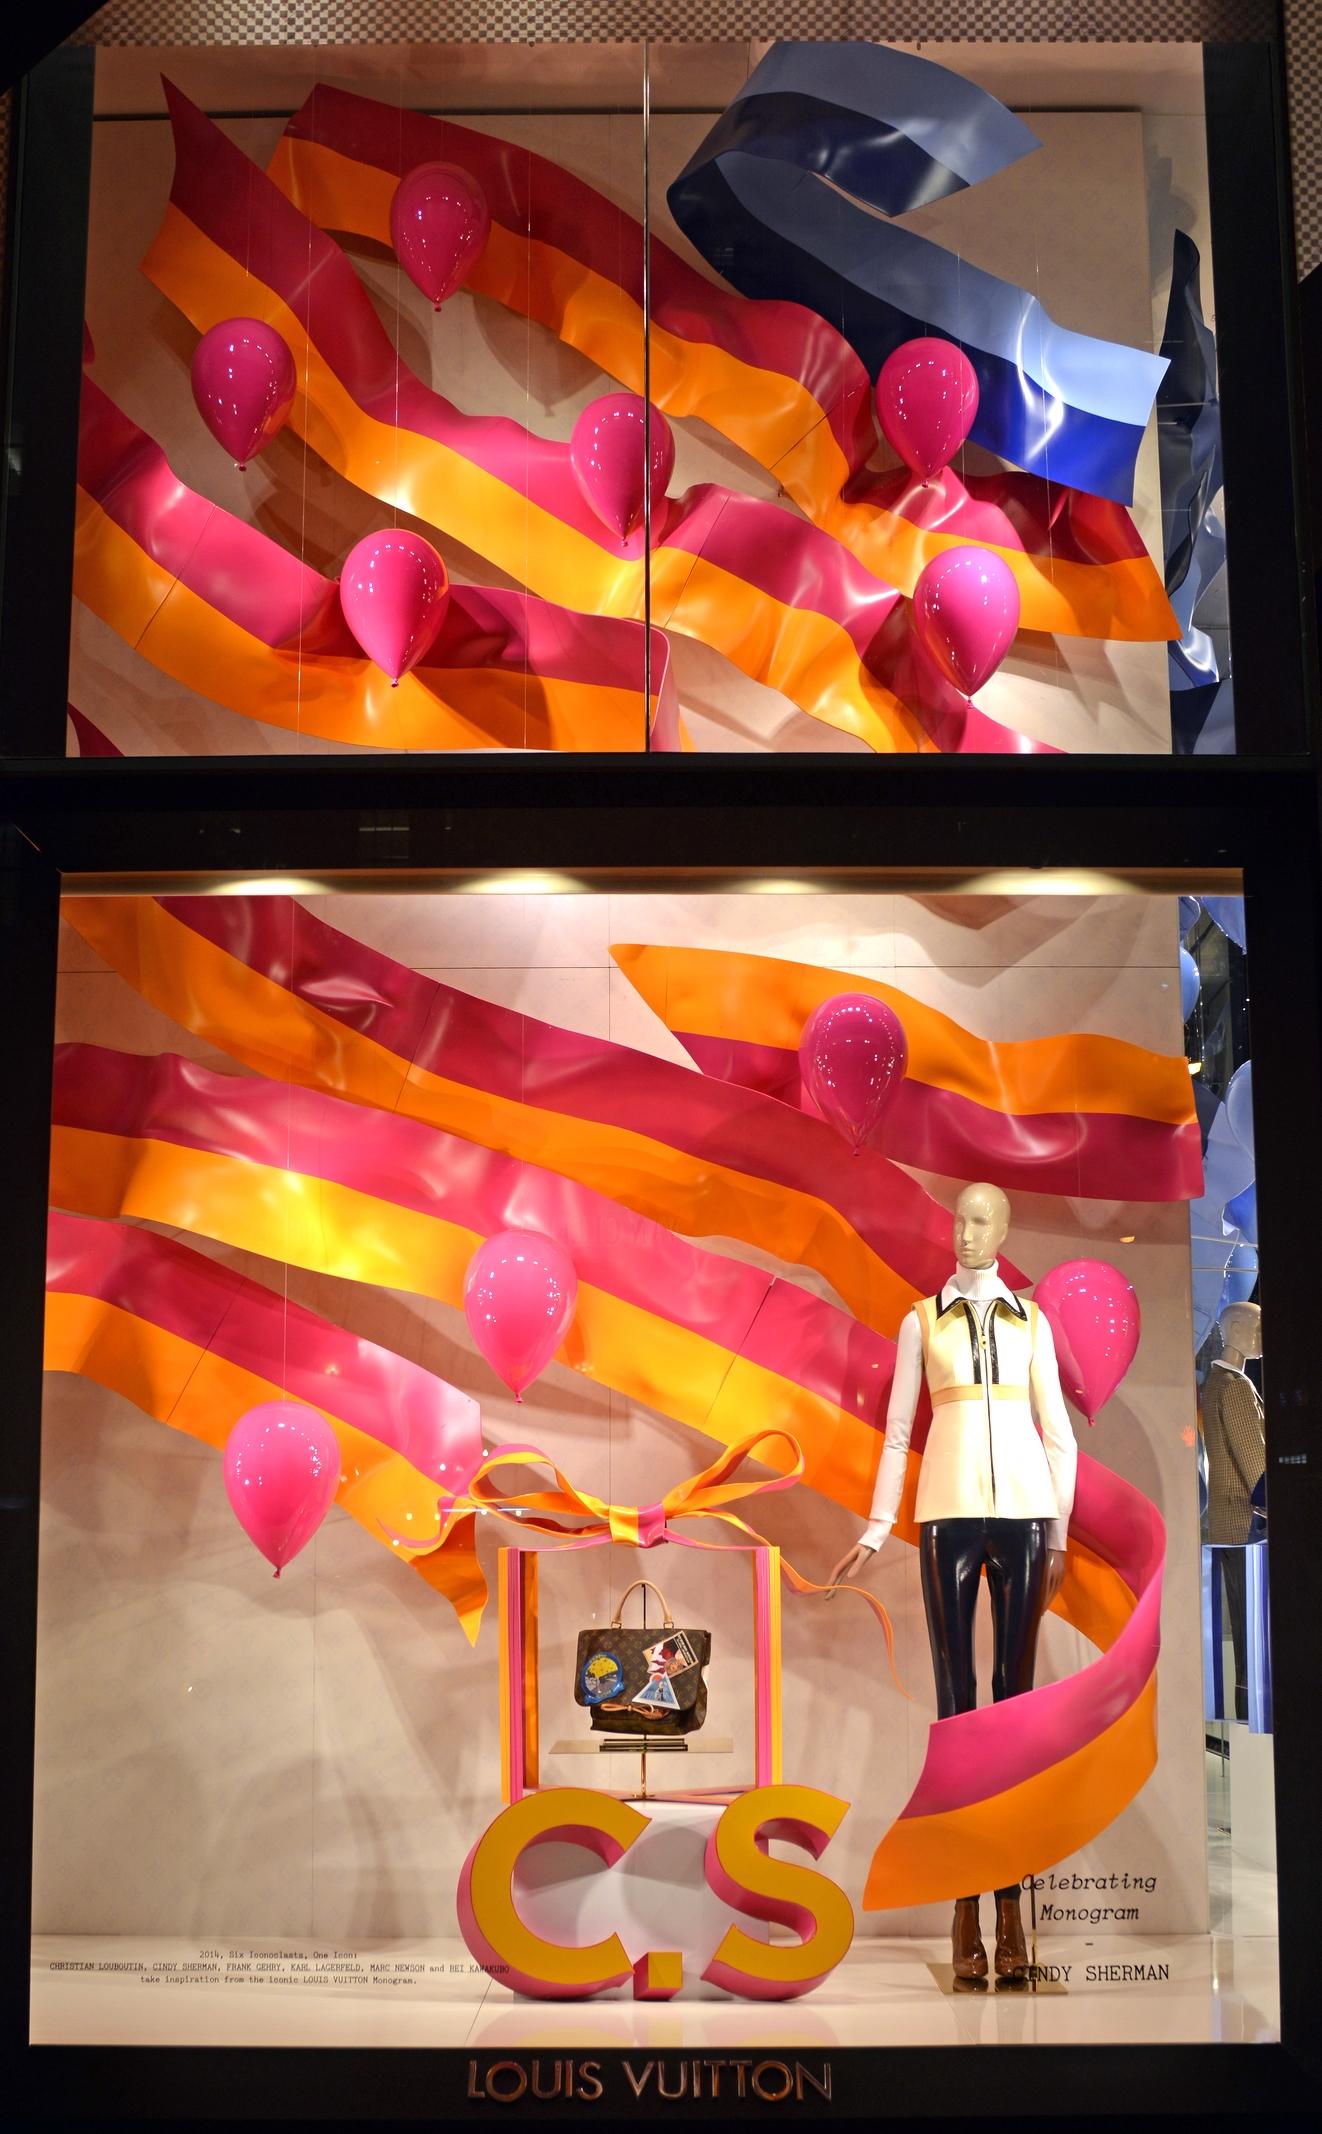 Window Display for Cindy Sherman - Louis Vuitton